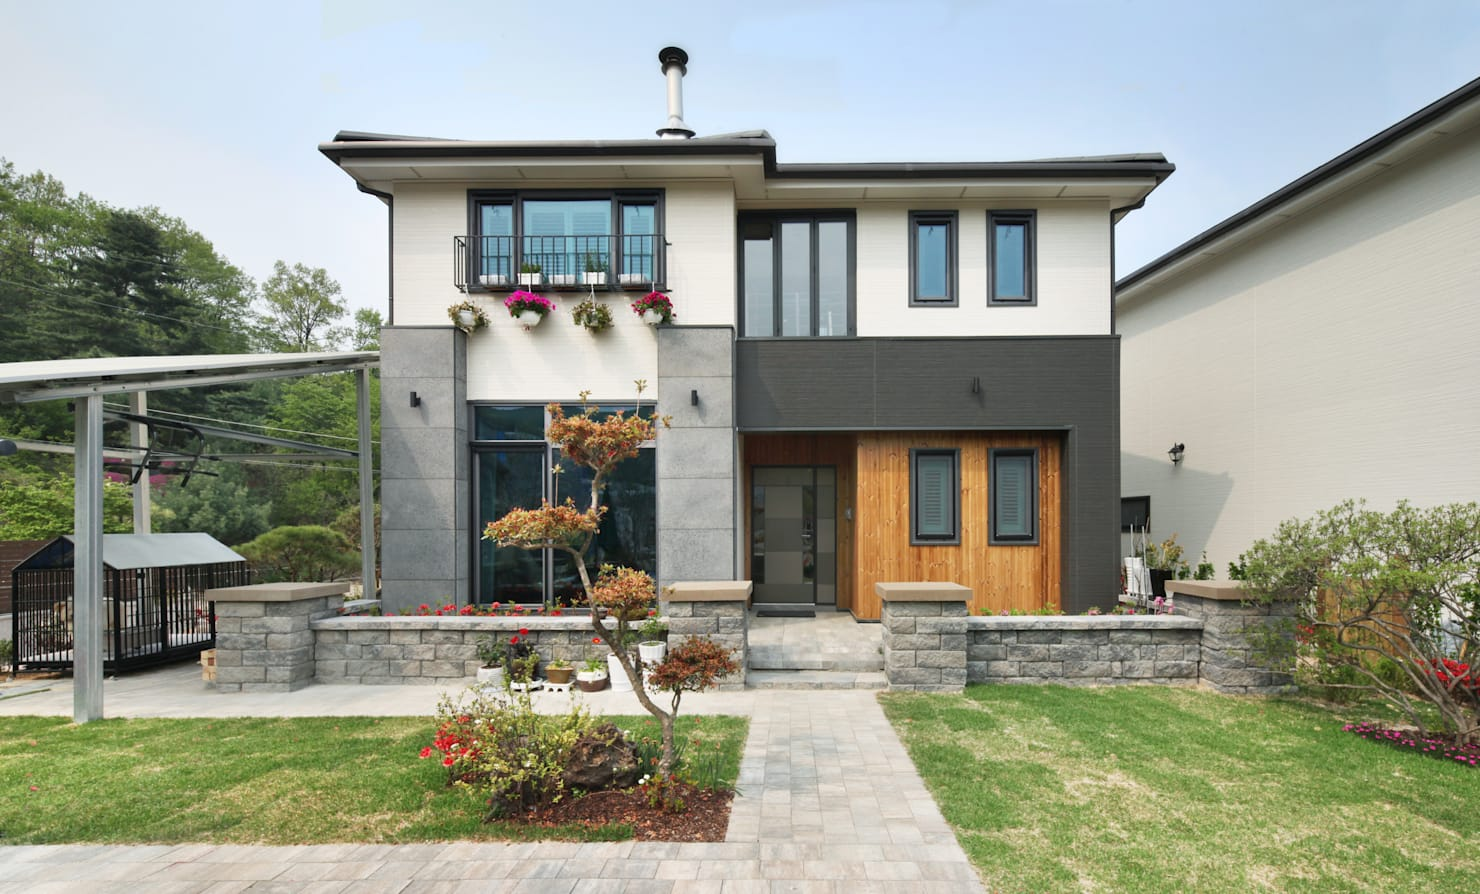 House design: The house of harmony